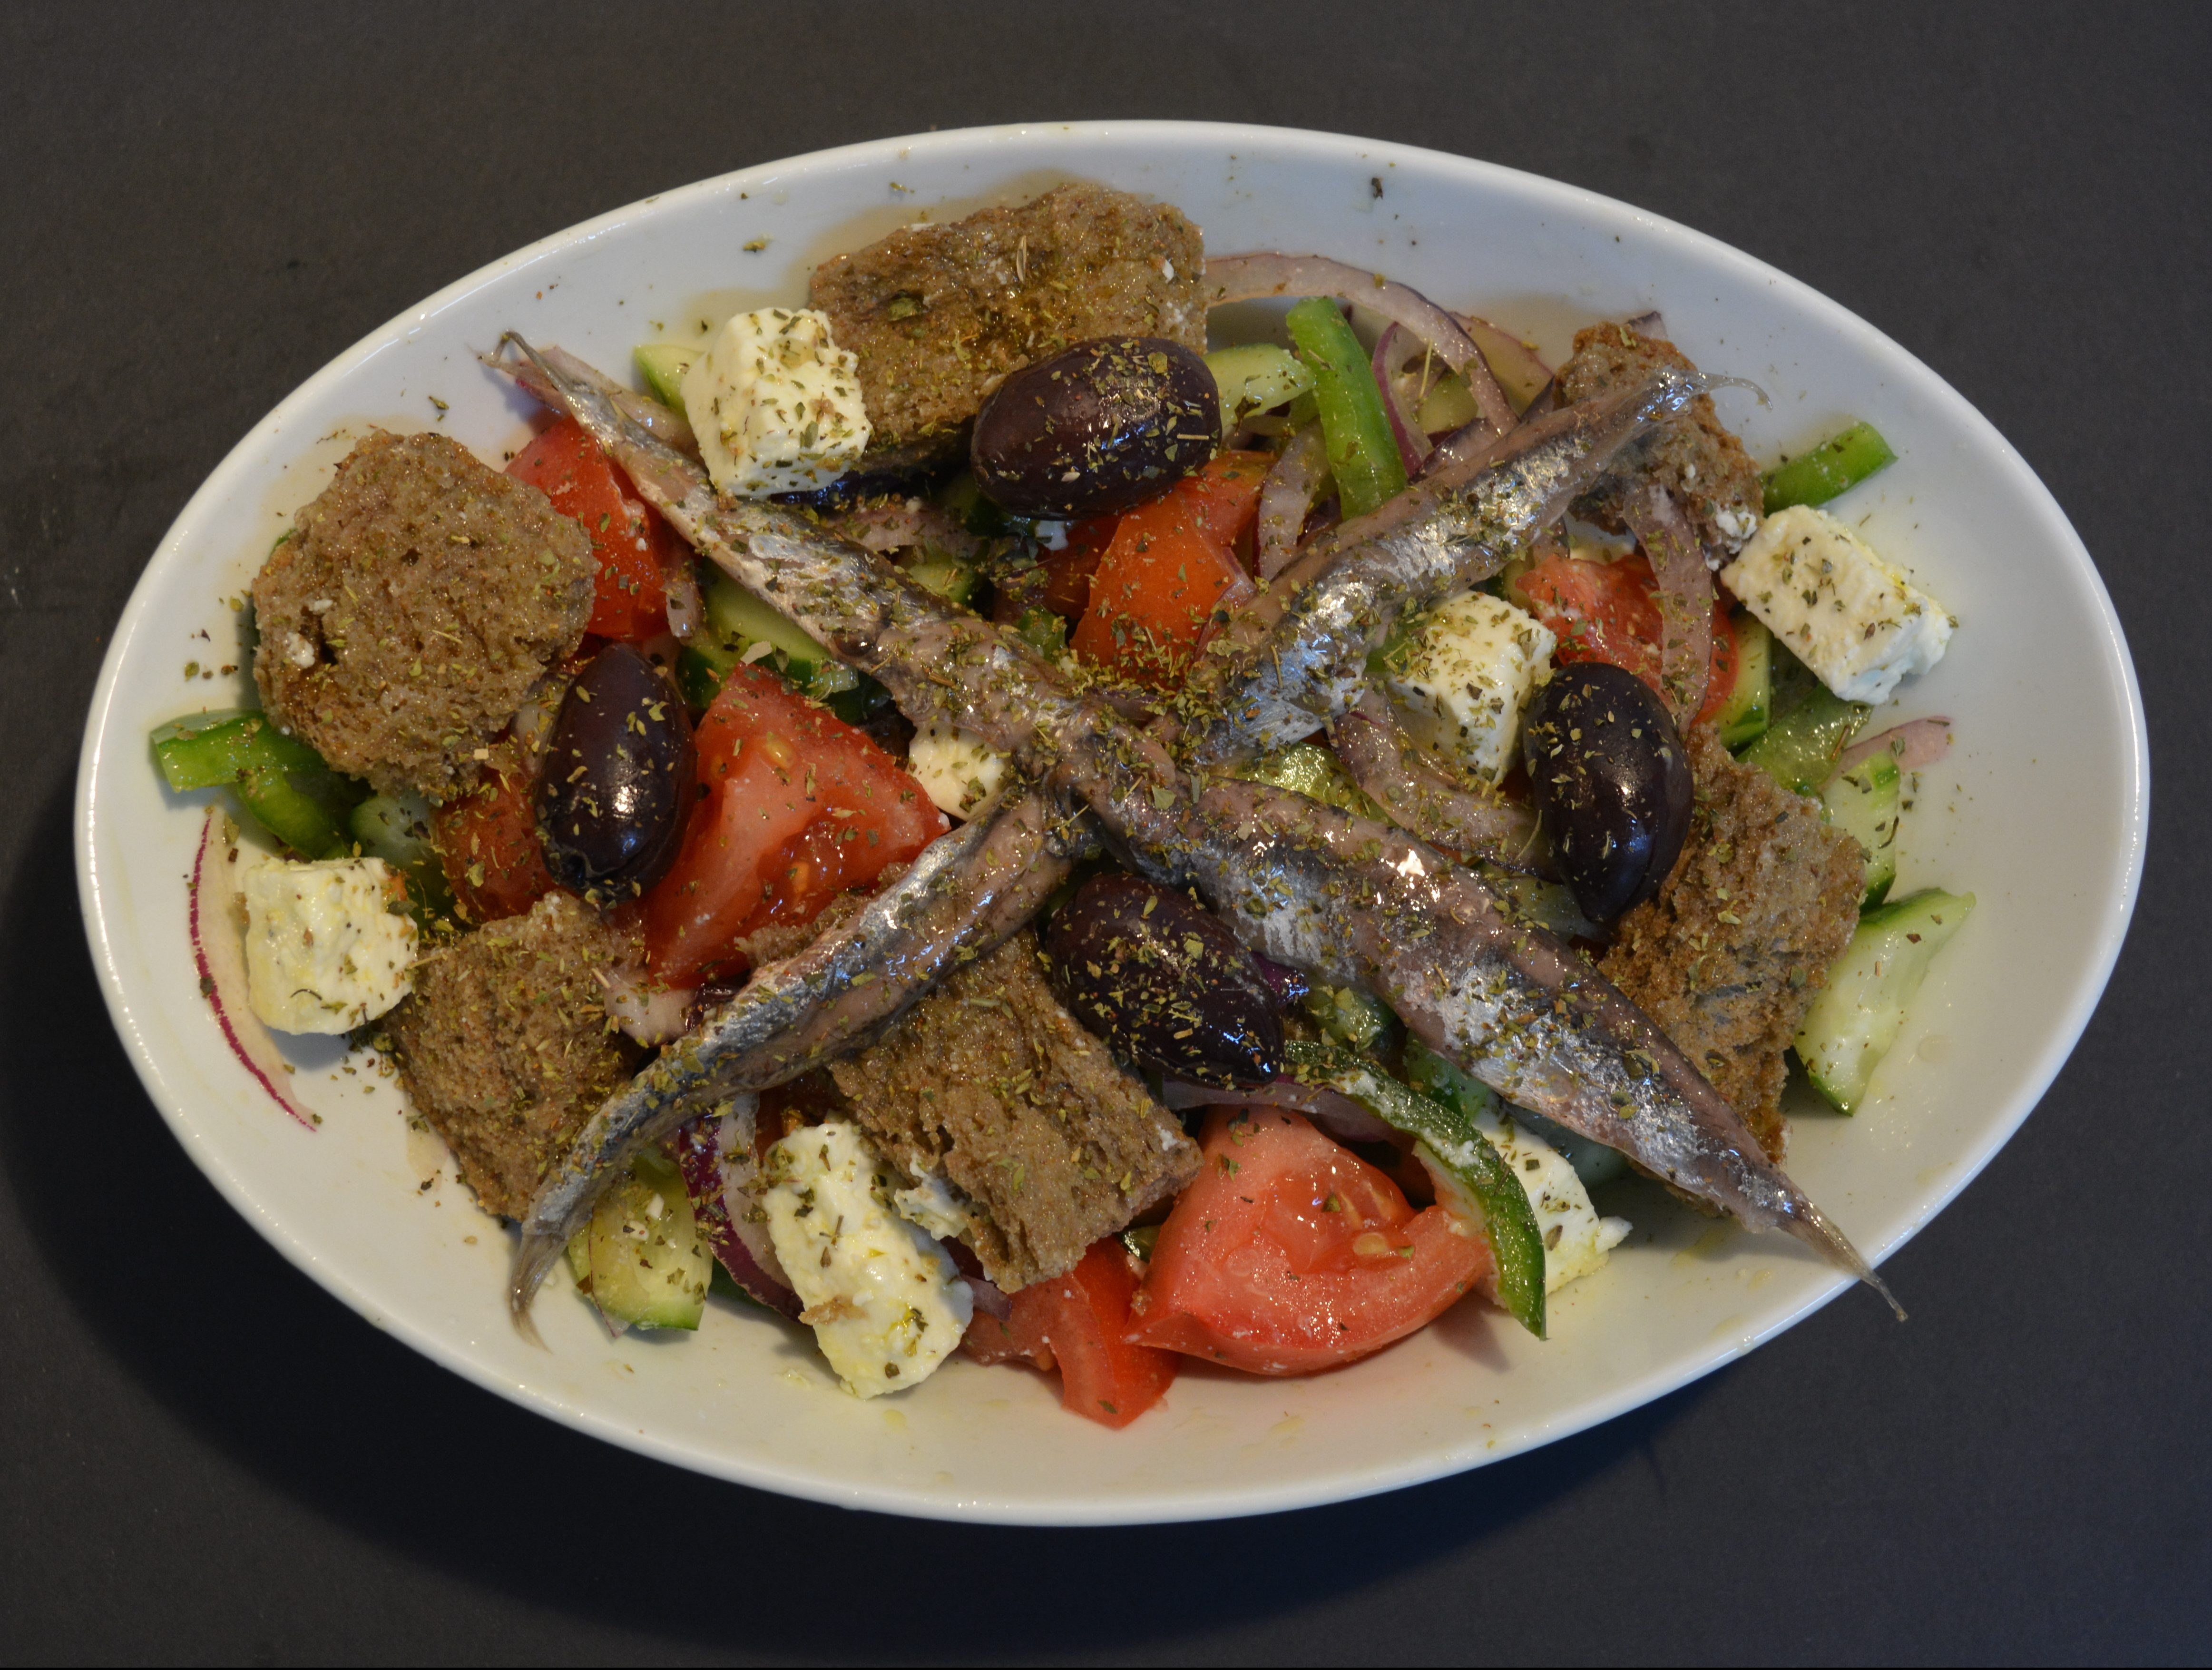 Greek Island Salad, including tomato, cucumber, capsicum, onion, olives, feta cheese, dry bread sticks, anchovies, extra virgin olive oil, oregano.